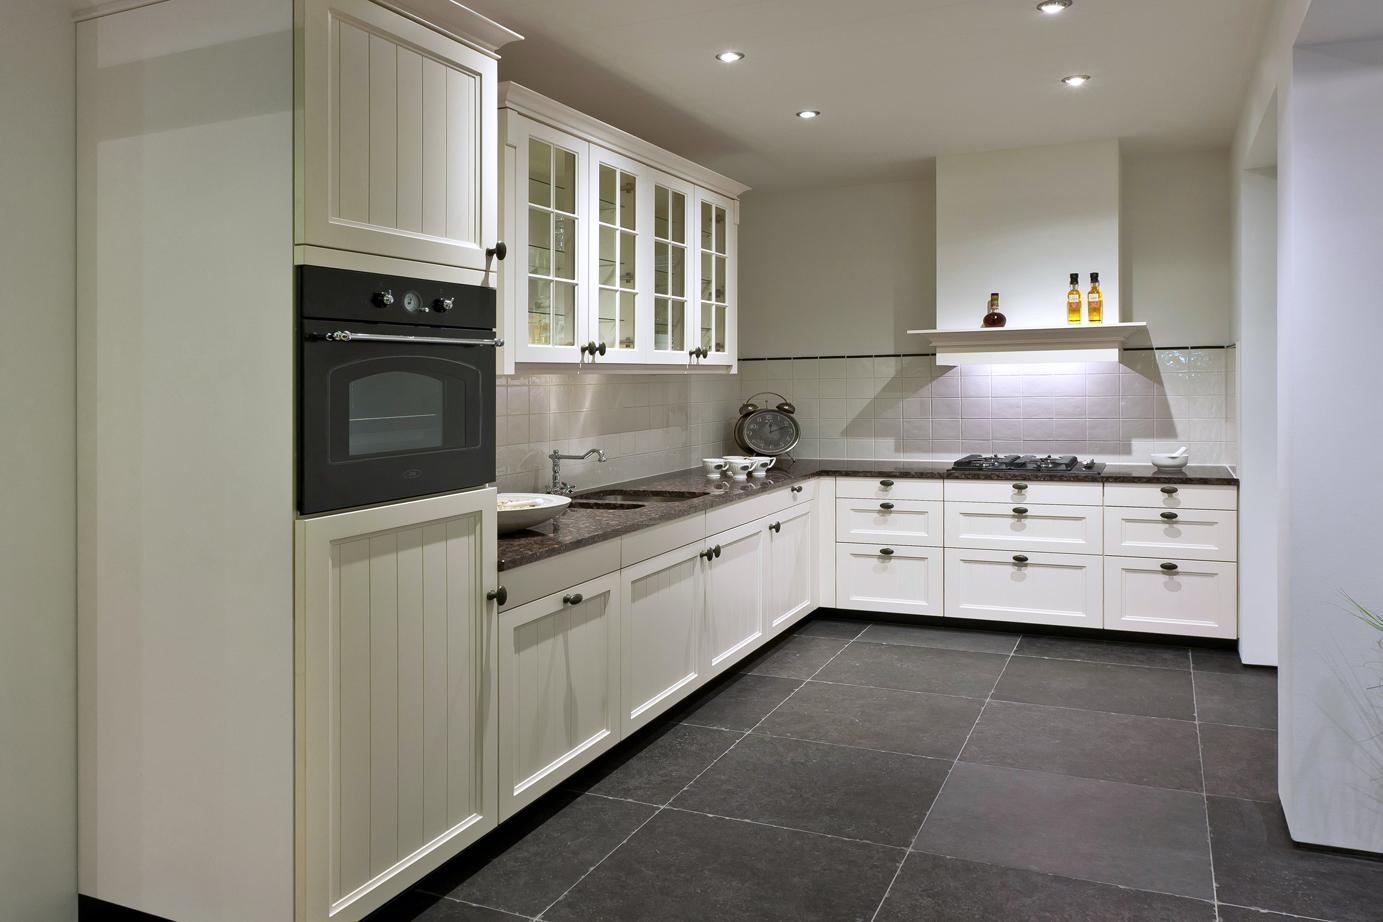 Hoekkast Keuken Ikea : Landelijke keuken ikea great modern interieur landelijke keuken